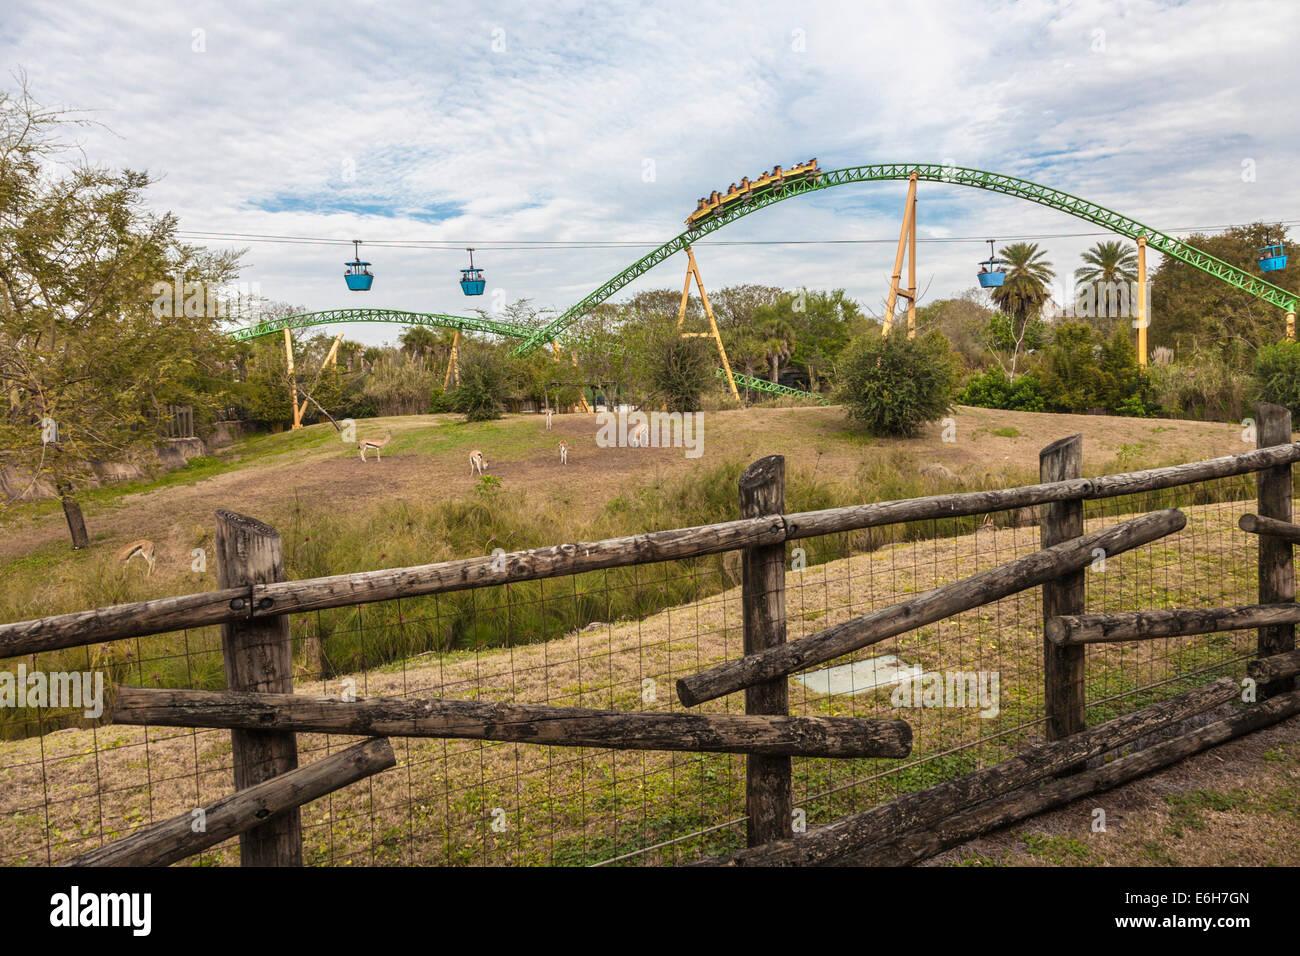 Cheetah Hunt roller coaster winding through animal habitat and past ...